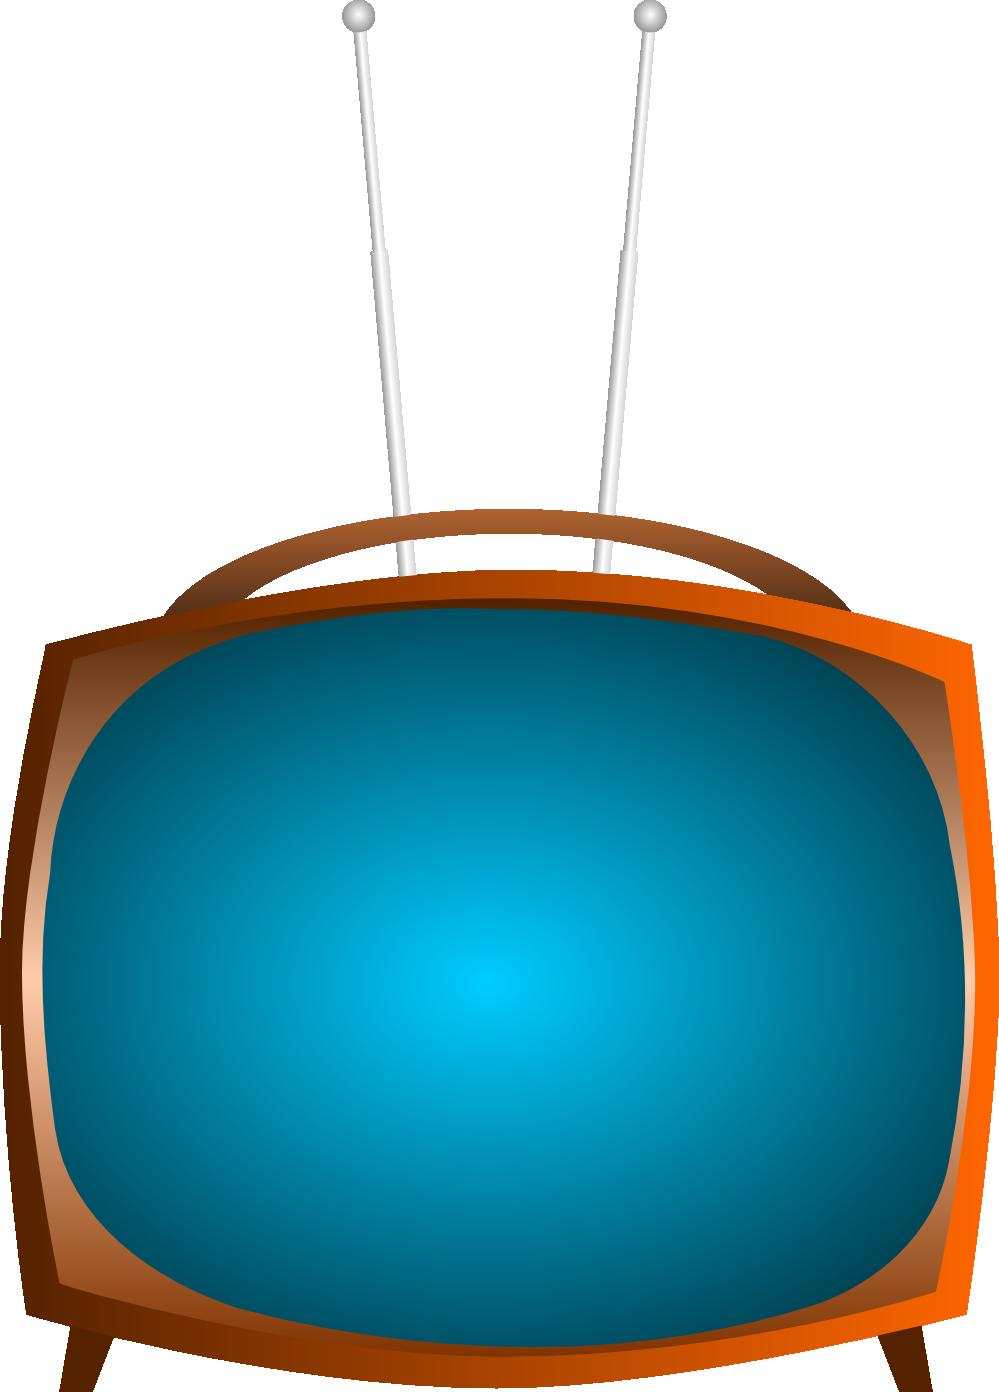 999x1392 Tv Television Clip Art 3 Image 0 Famclipart